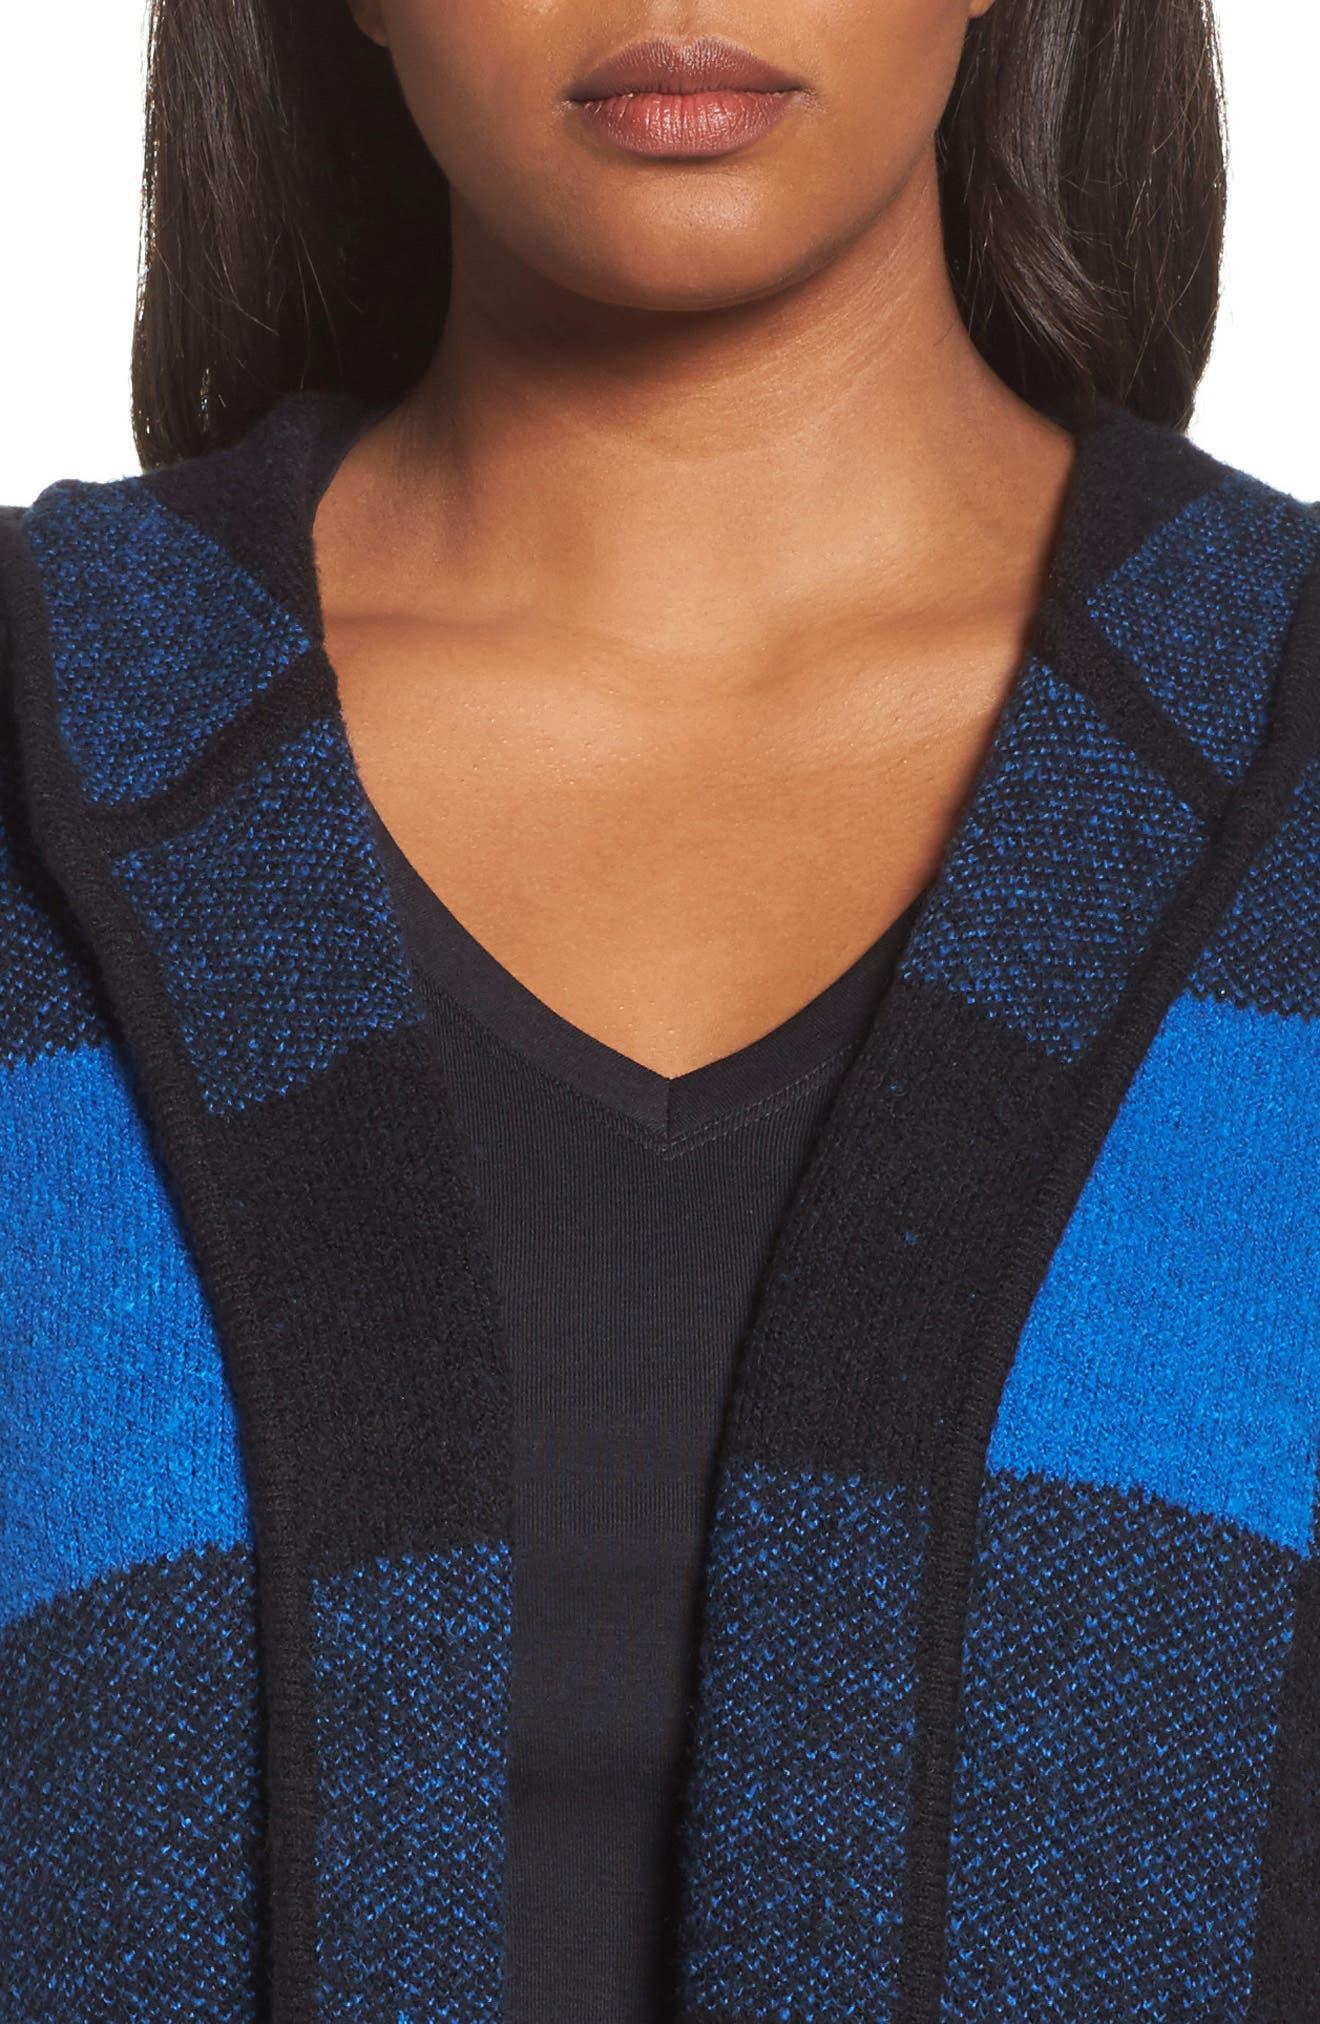 Plaid Hooded Sweater Coatigan,                             Alternate thumbnail 4, color,                             Blue Checkerboard Jacquard